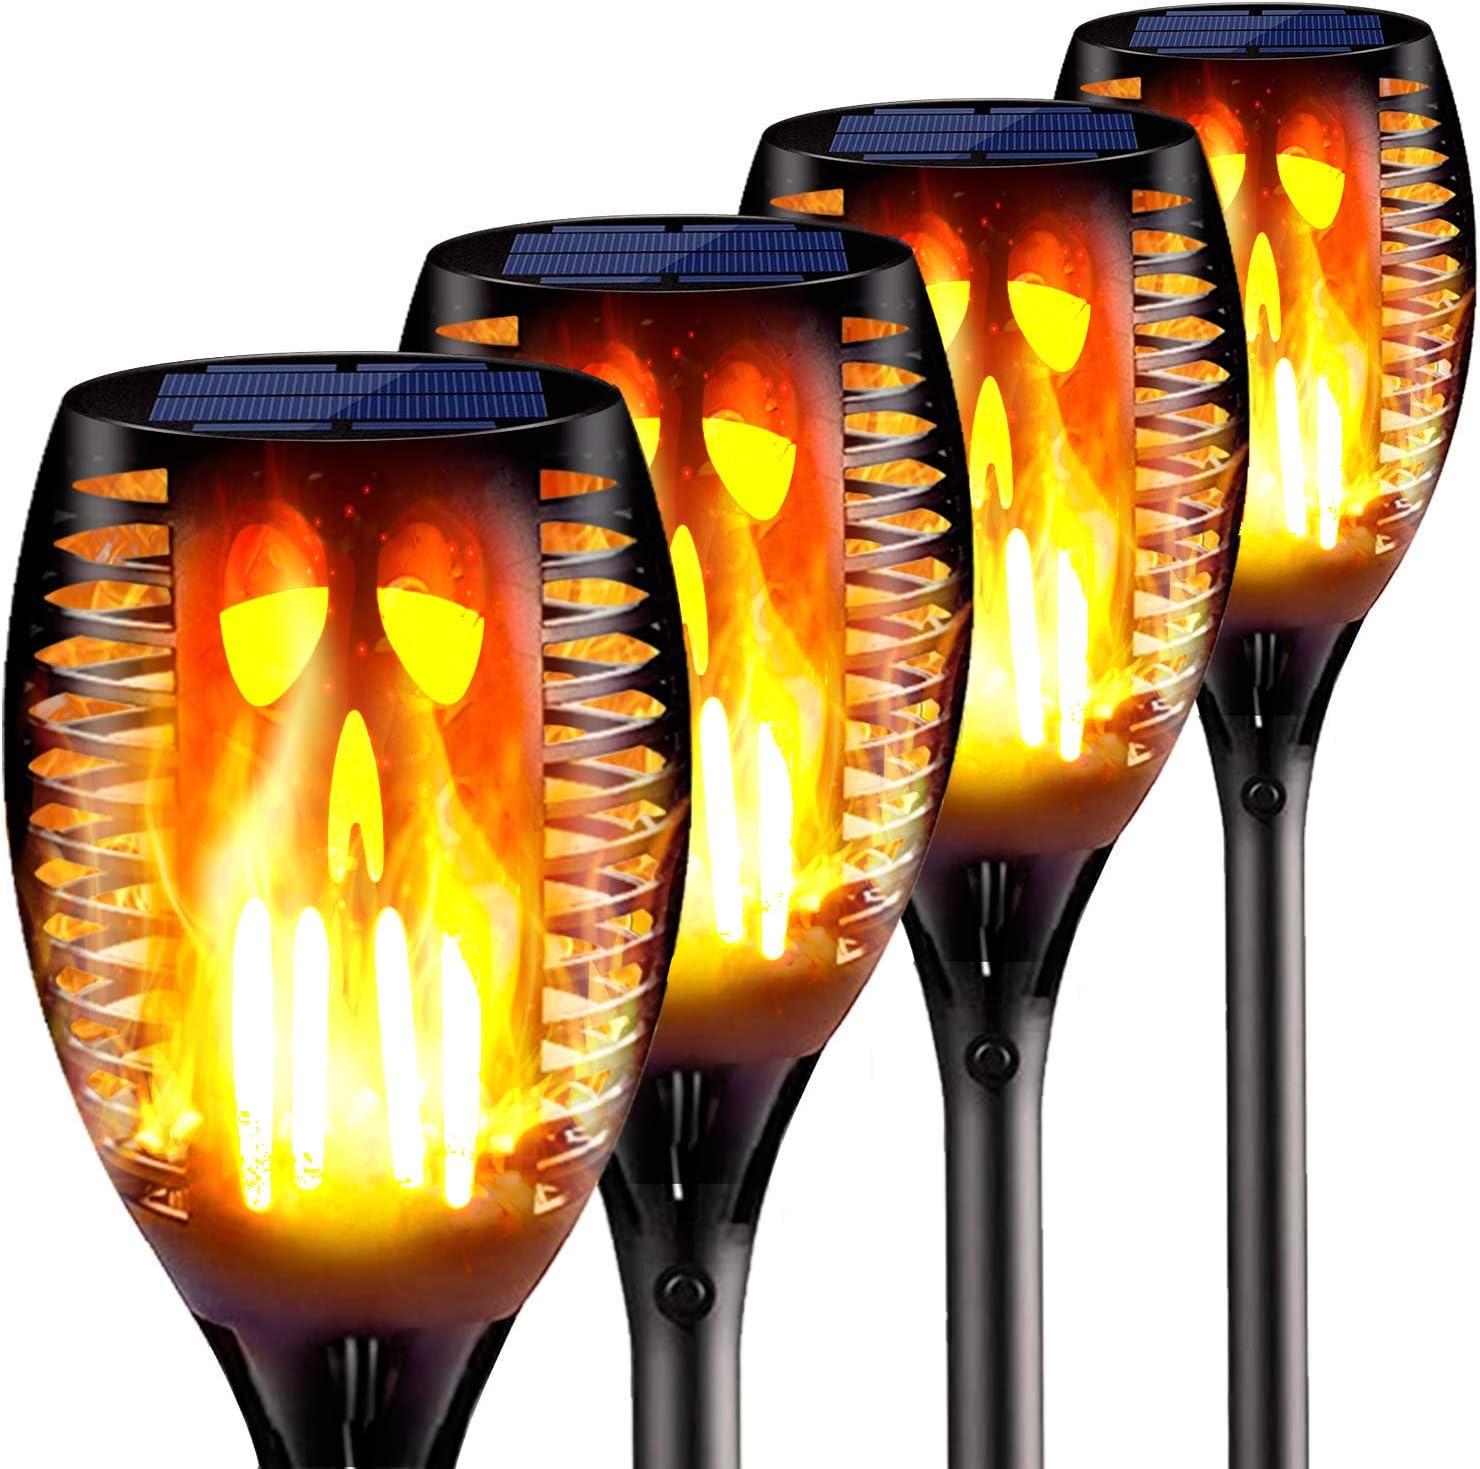 StillCool 2 Pack Solar Flickering Flame Torch Lights Waterproof Decoration Lighting for Garden Pathway Driveway Patio Outdoor Solar Garden Lights Dusk to Dawn Auto On//Off